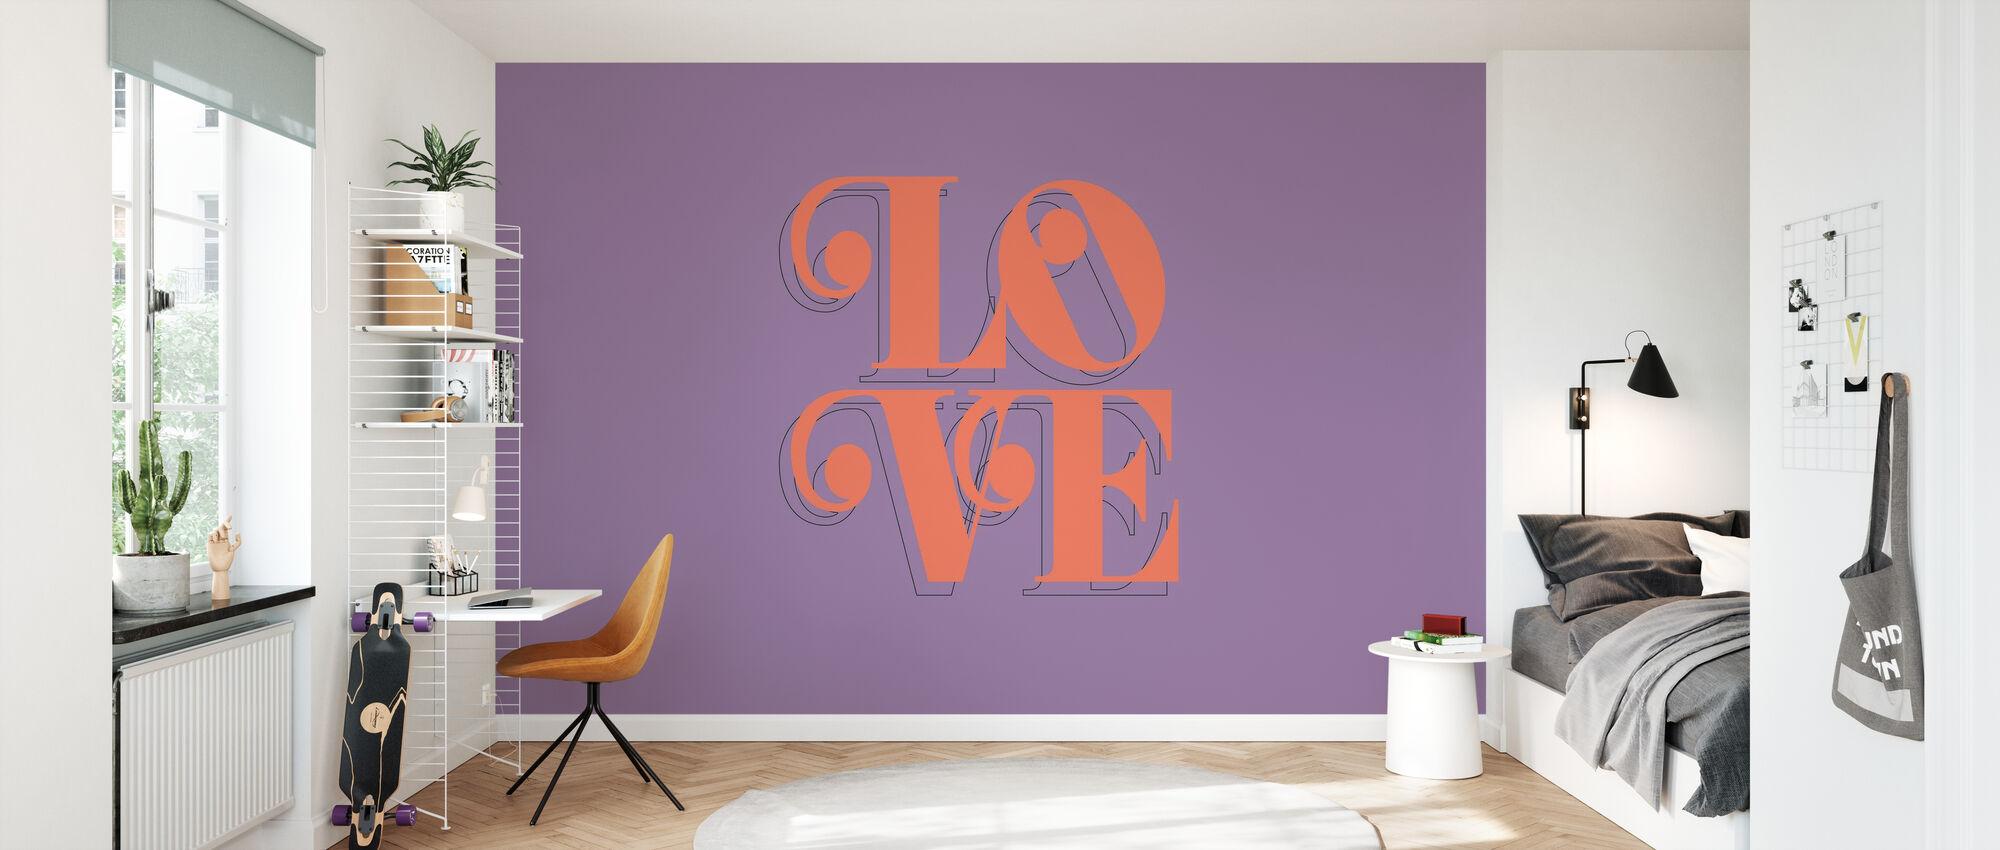 Liefde Fruit - Behang - Kinderkamer